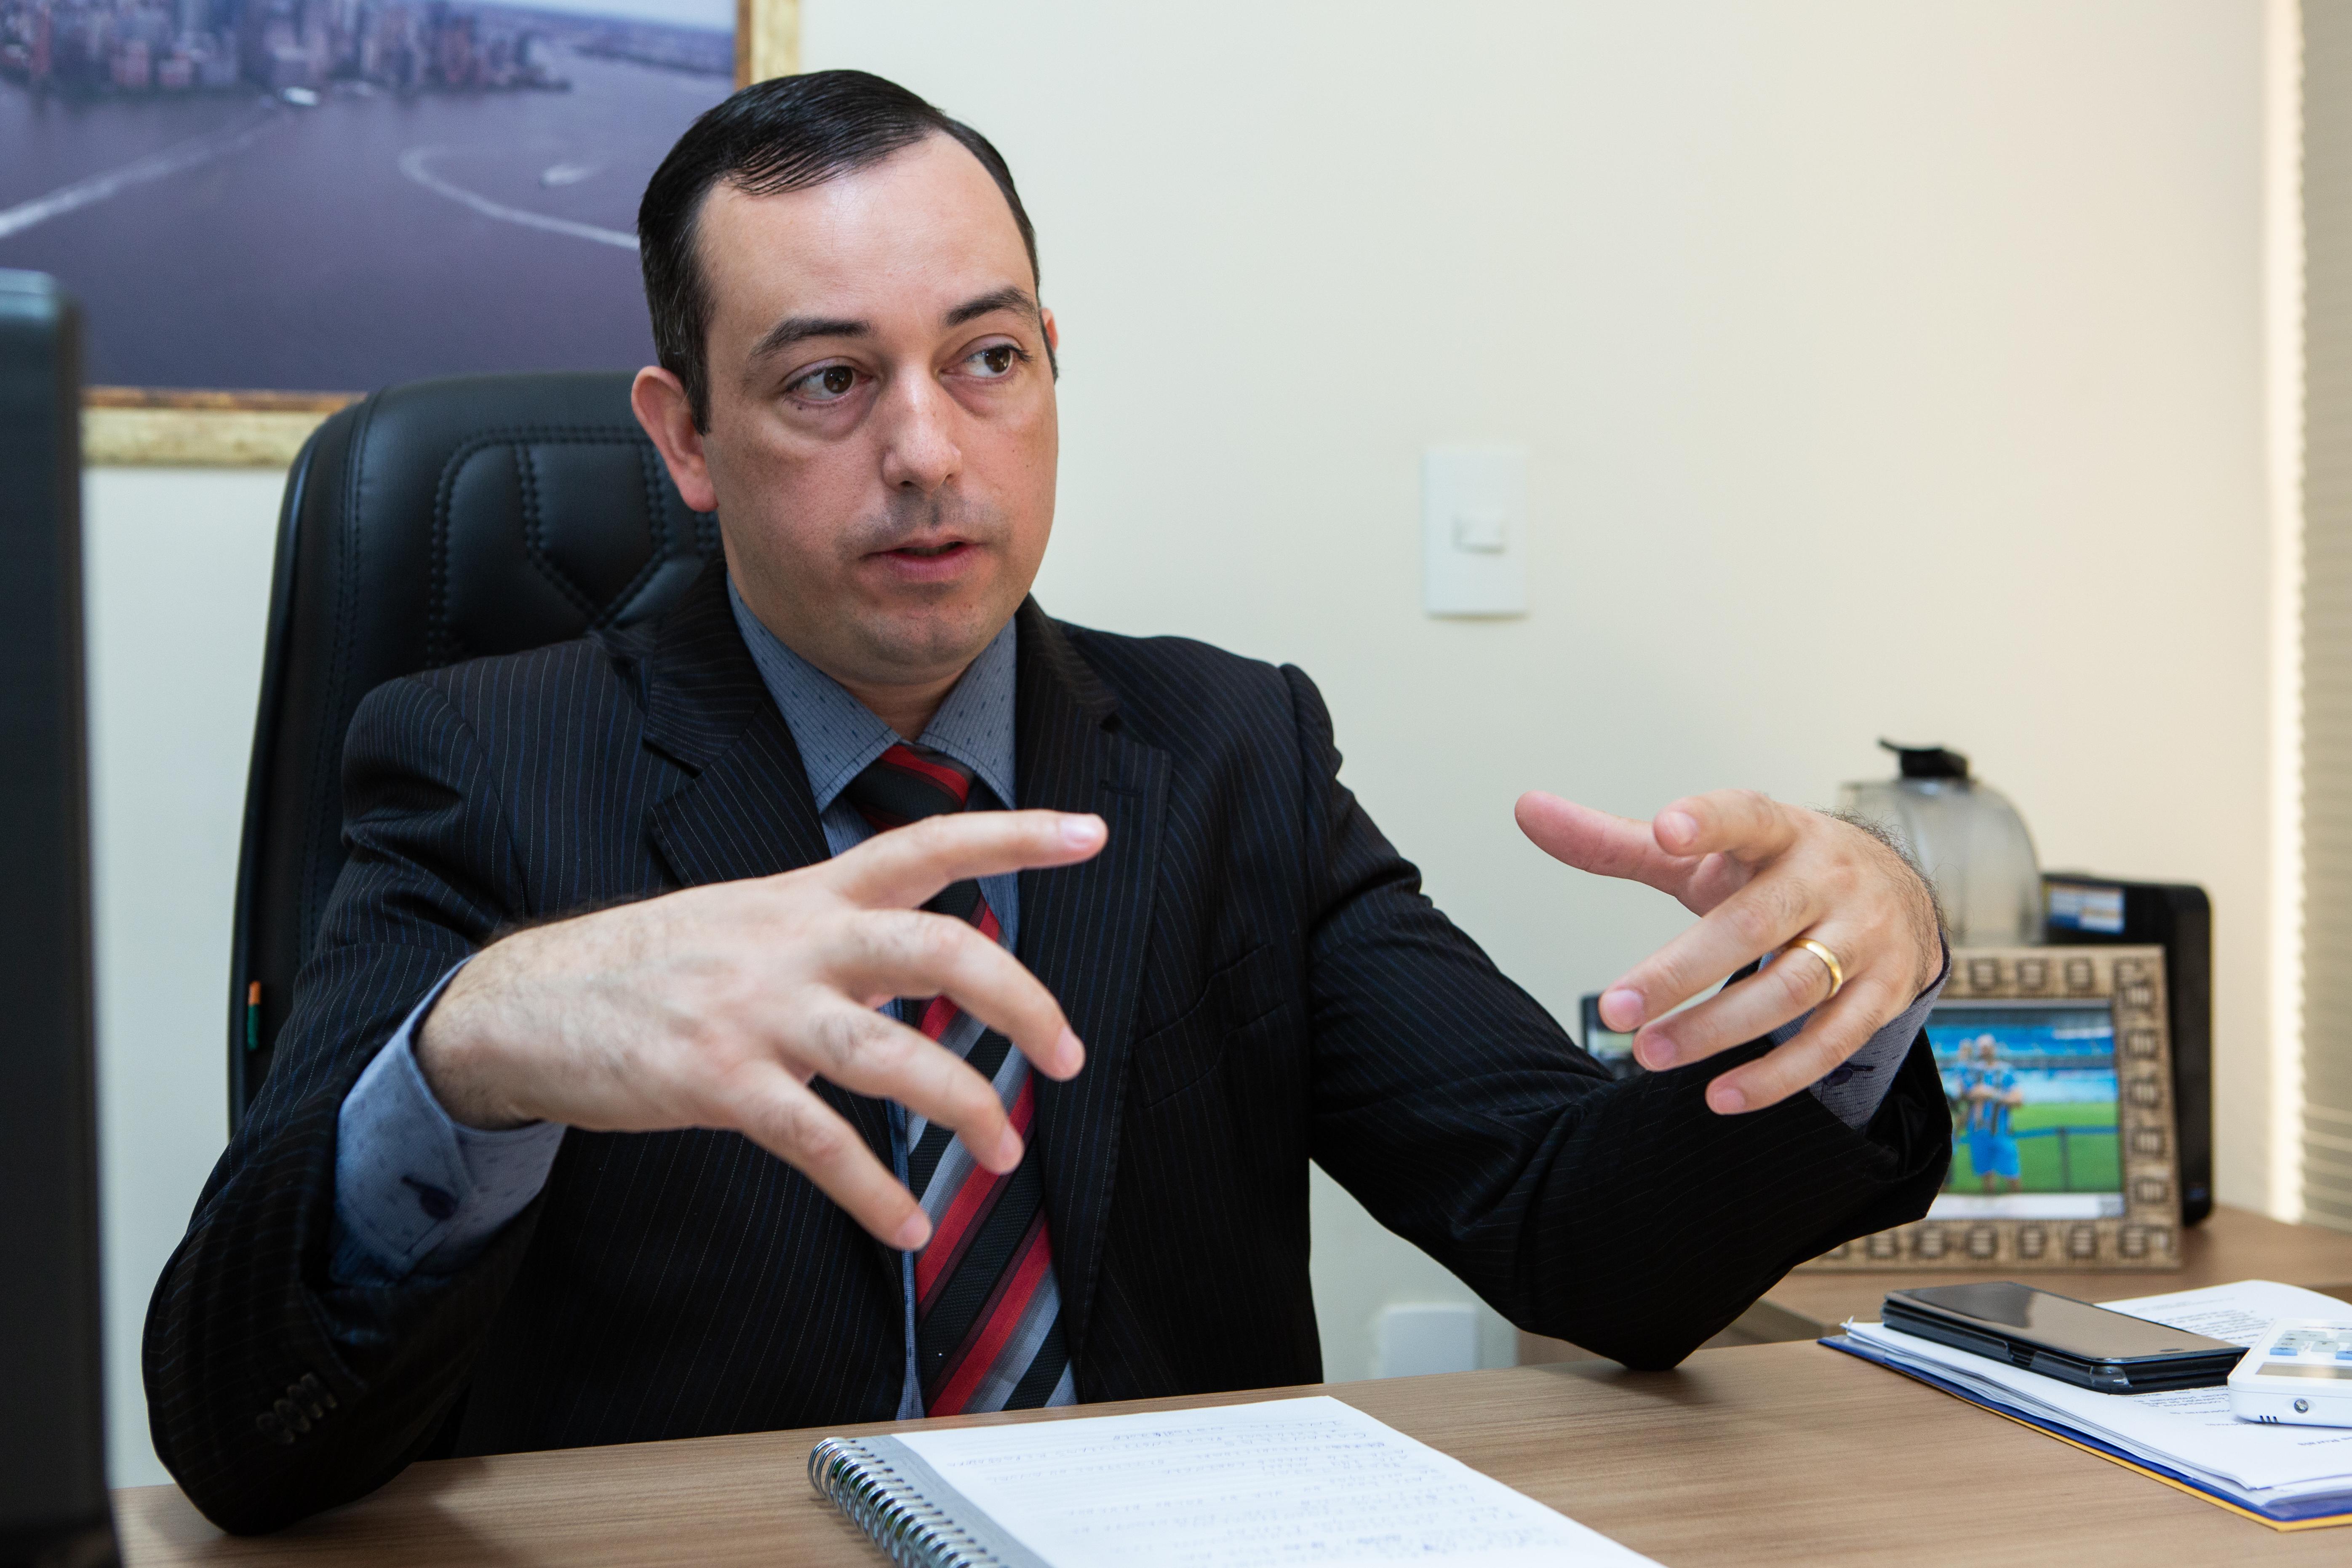 Burocracia prejudica acesso ao crédito agrícola, alerta consultor